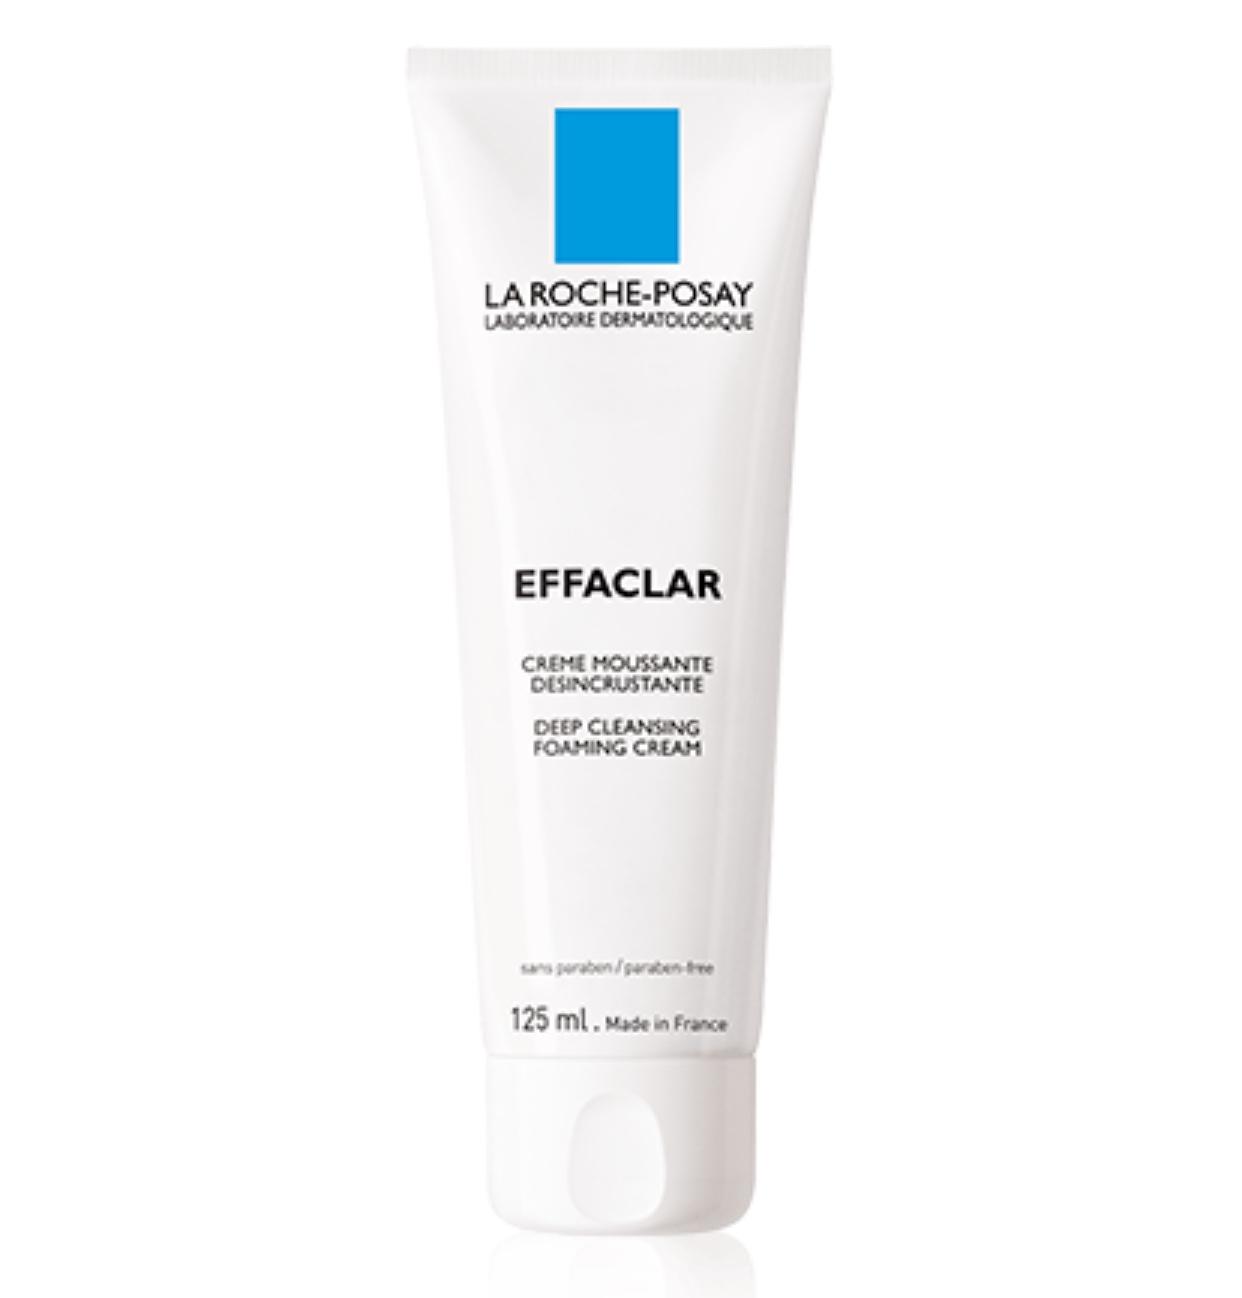 La Roche-Posay Effaclar Deep Cleansing Foaming Cream